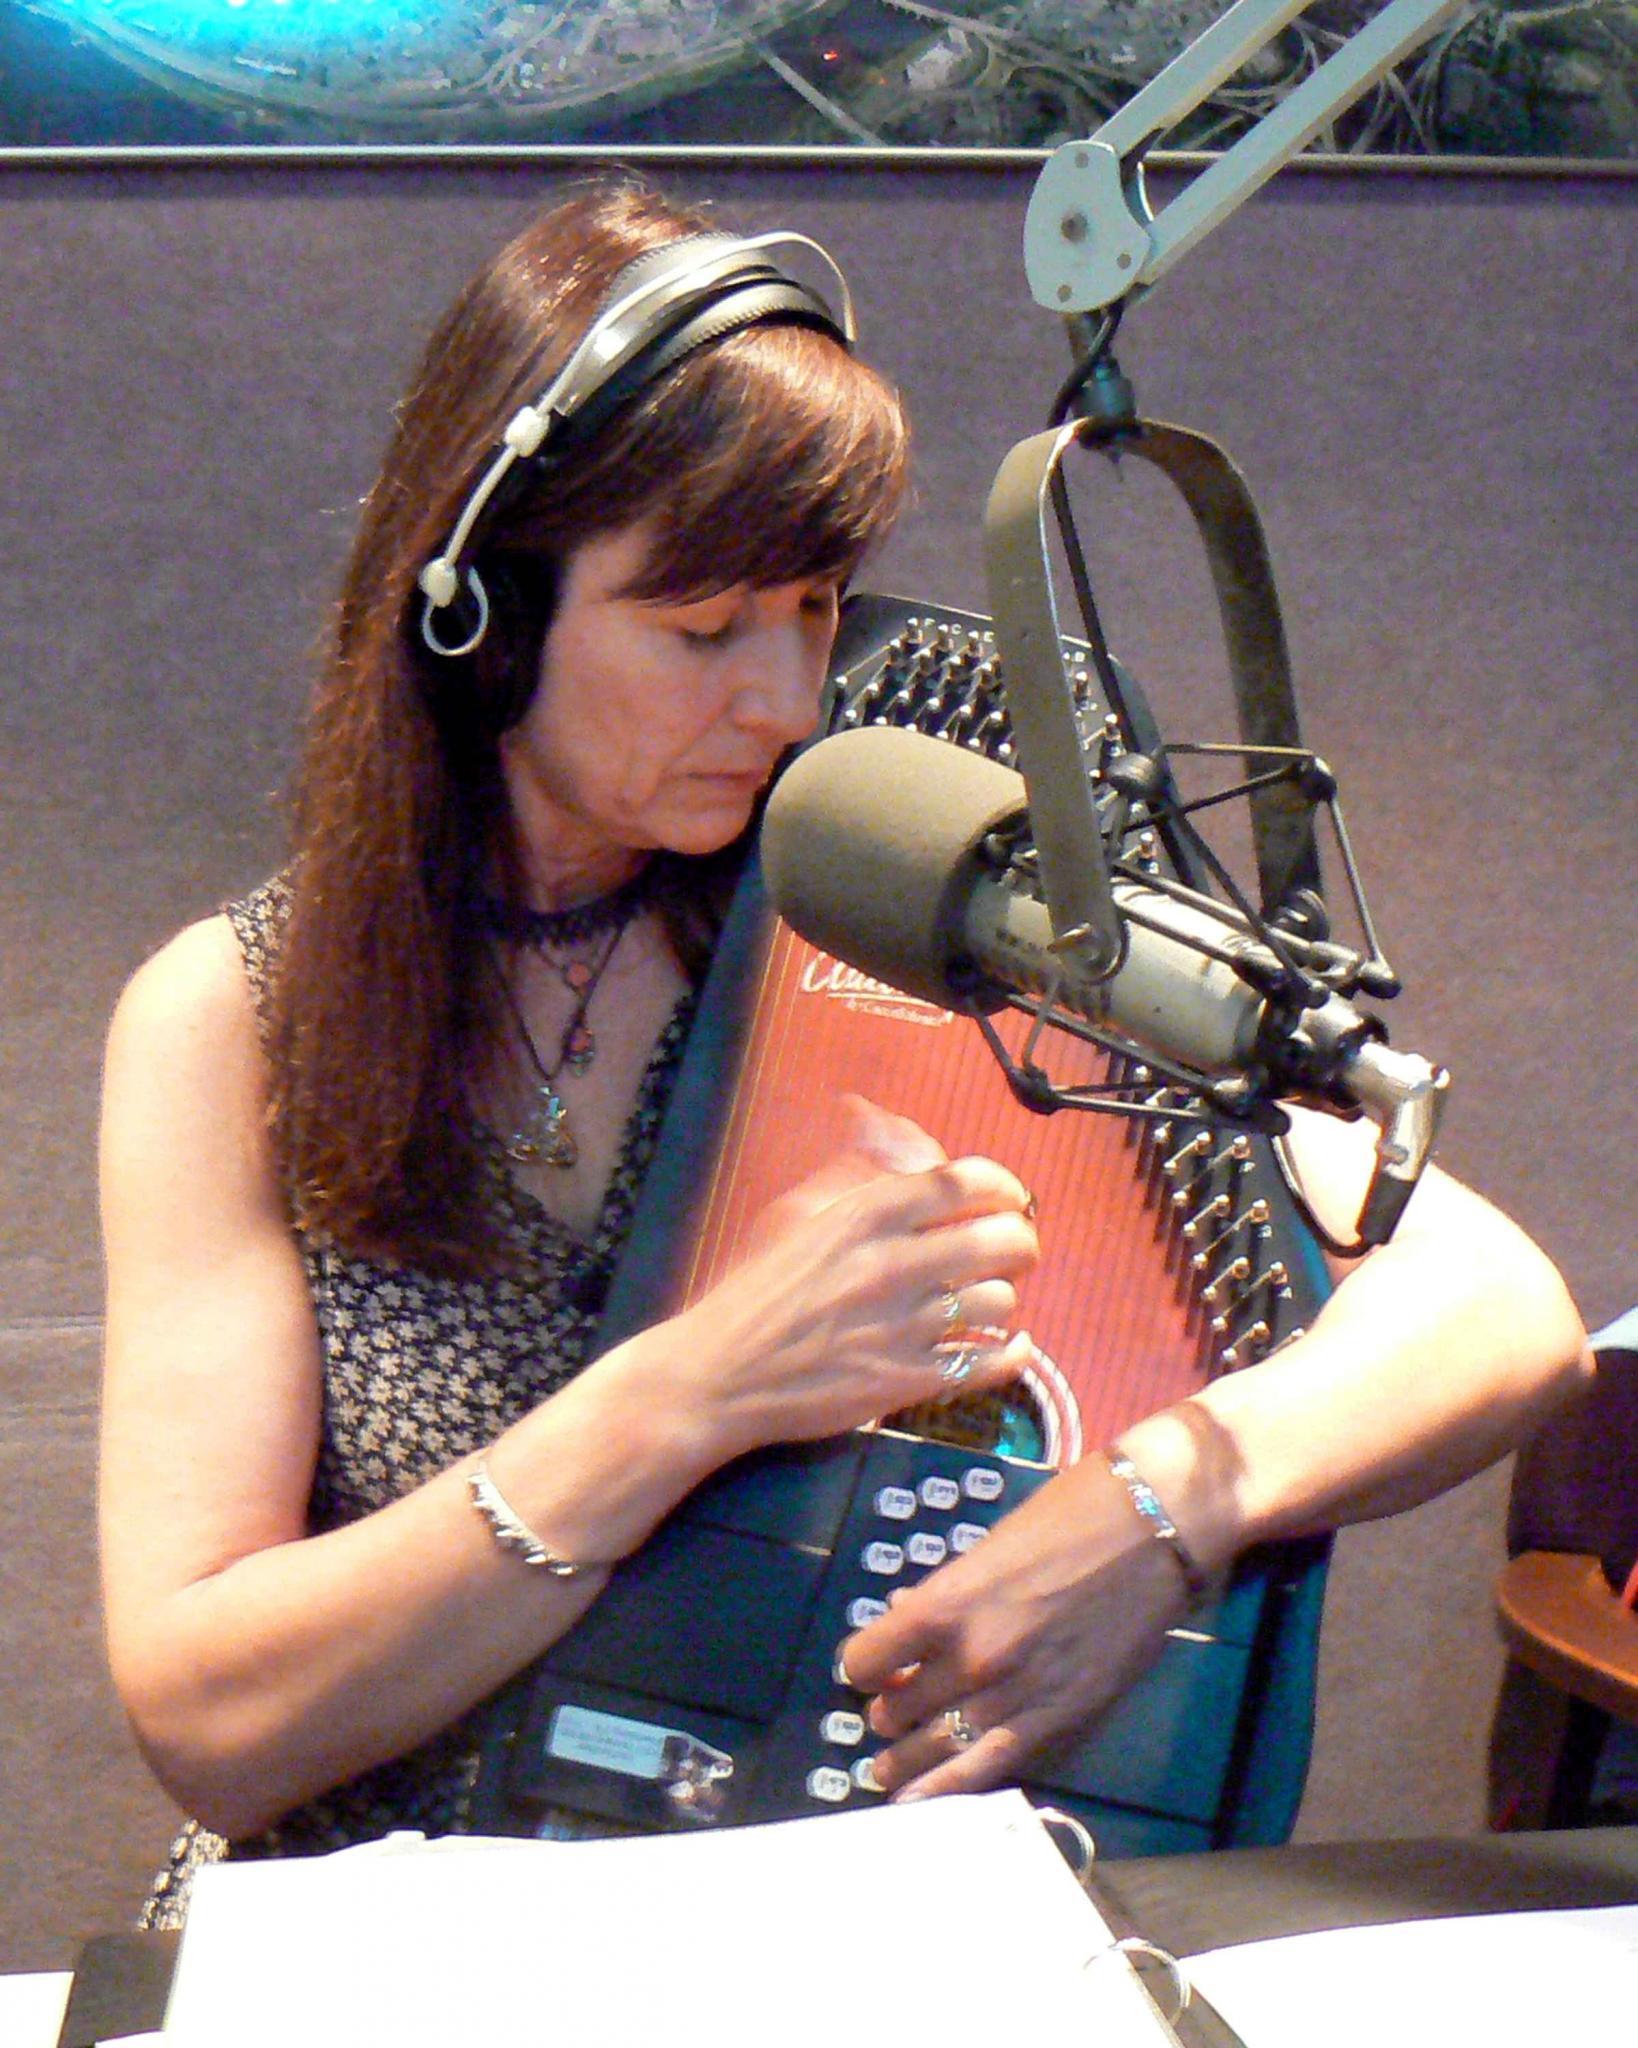 WWUH Radio 91.3 FM